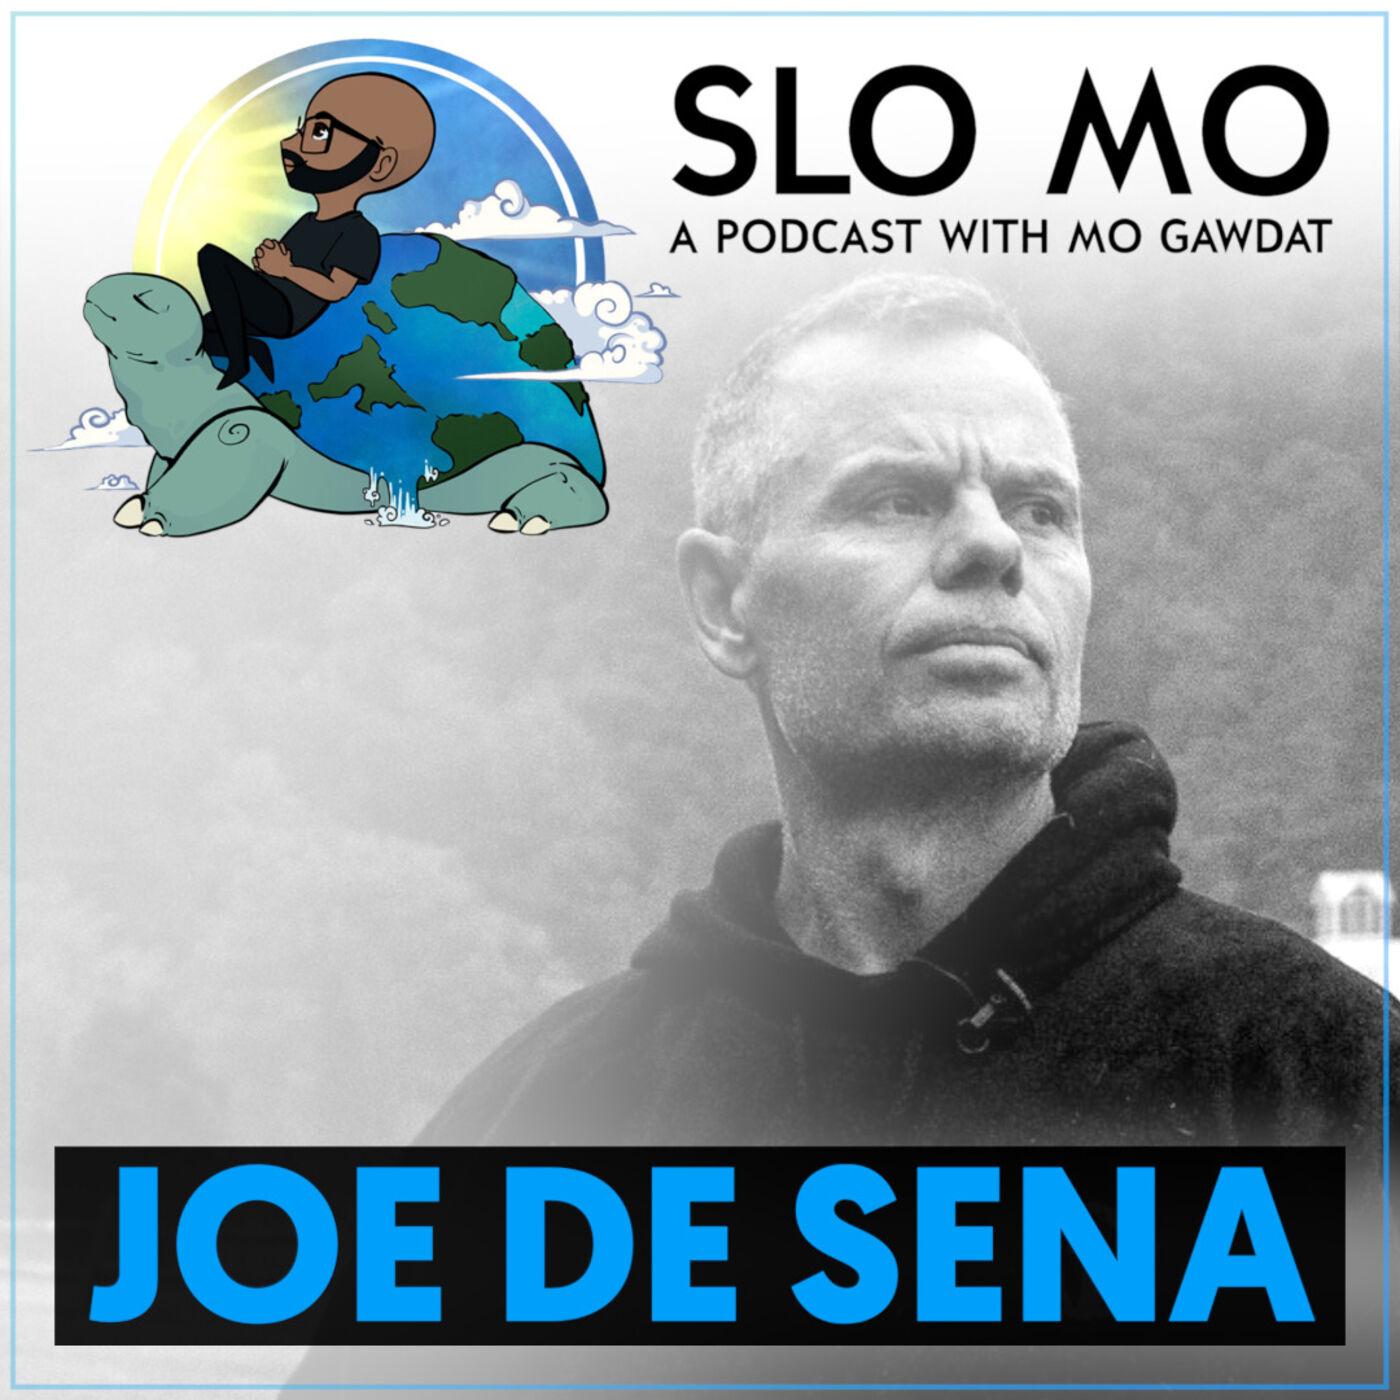 Joe de Sena - 'Slo Mo' vs. 'Fast Joe' and How to Calm the Mind through the Body